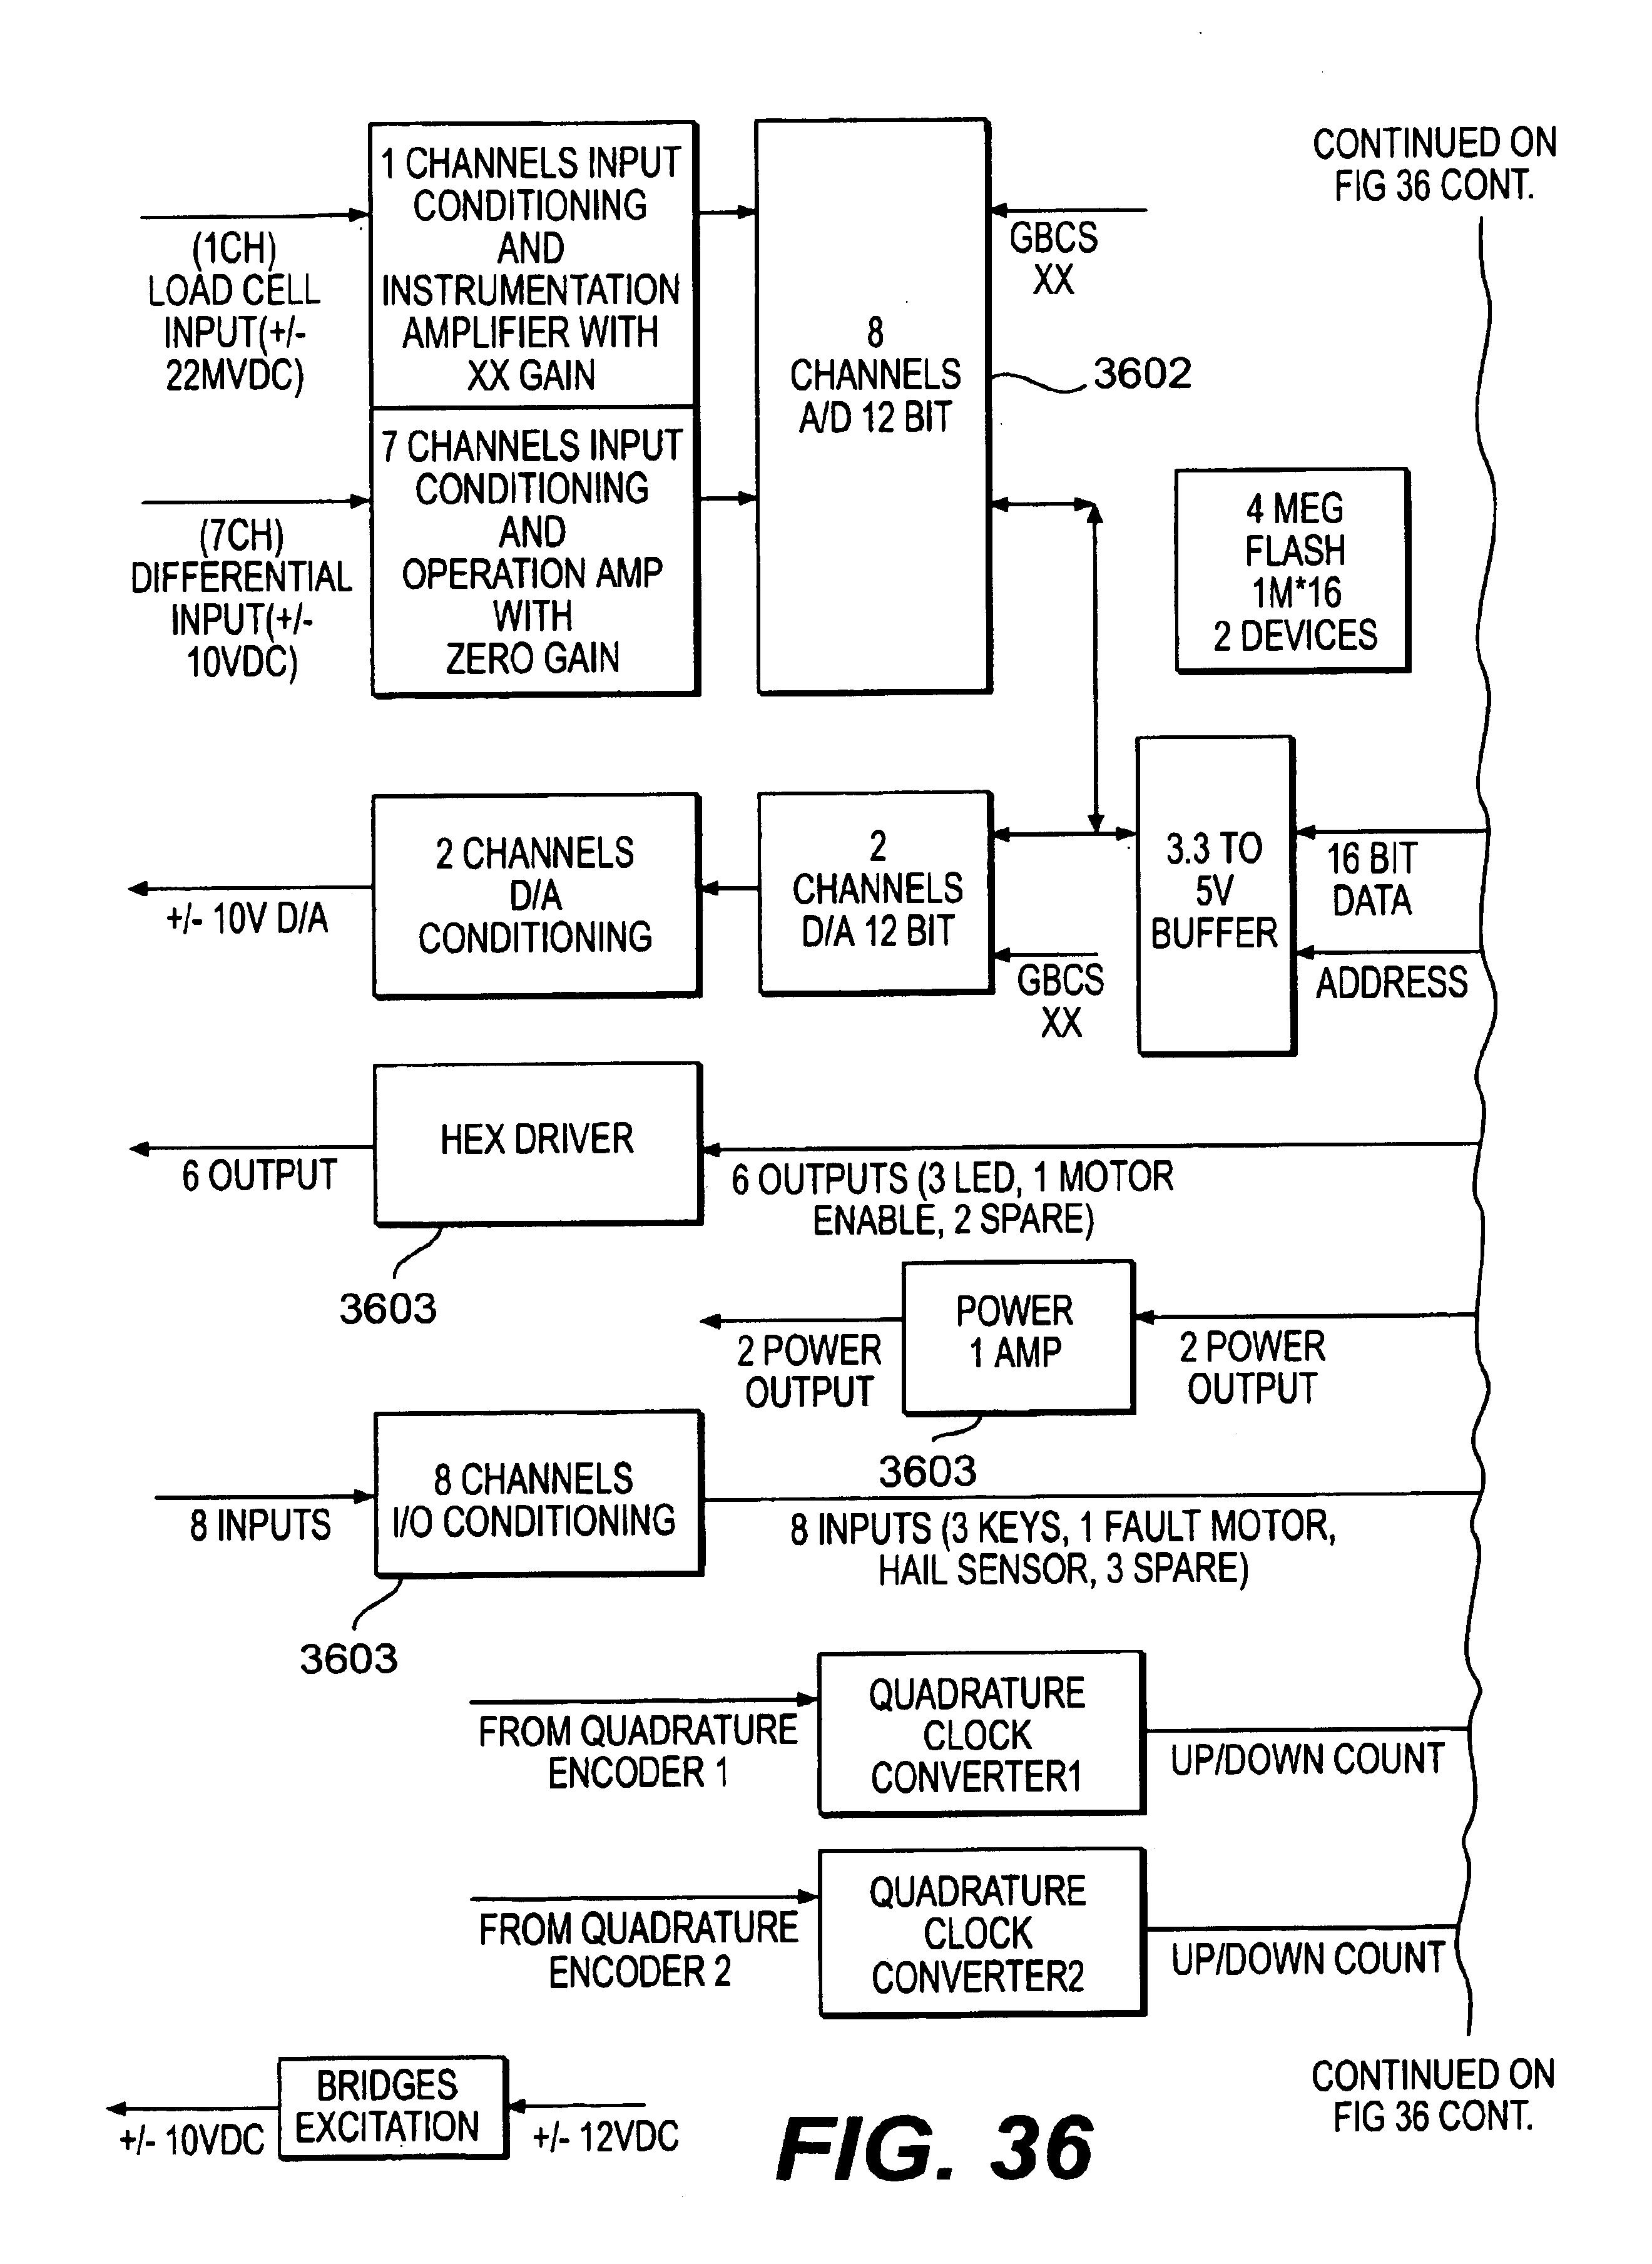 wiring diagram for auto crane markon alternator wiring diagram rh color castles com Ford Electronic Ignition Wiring Diagram Crane Motor Wiring Diagram